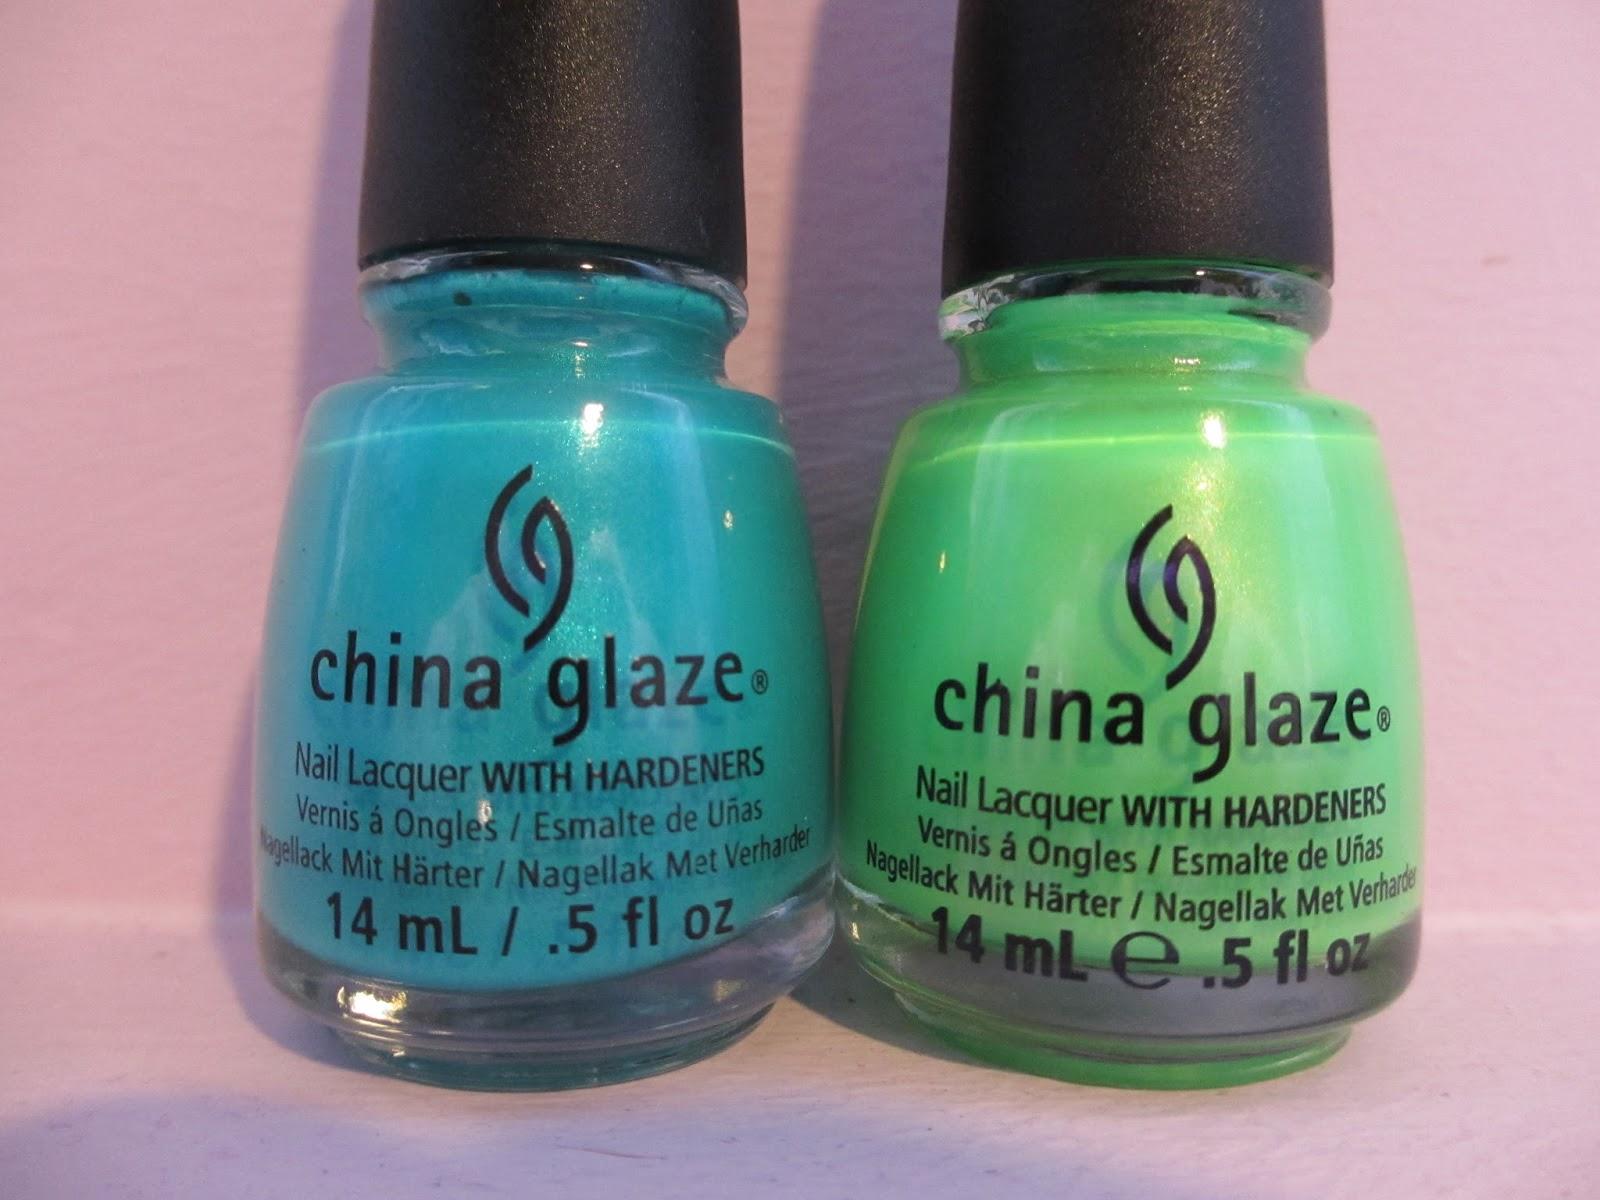 china glaze i'm with the lifeguard turned up turquoise